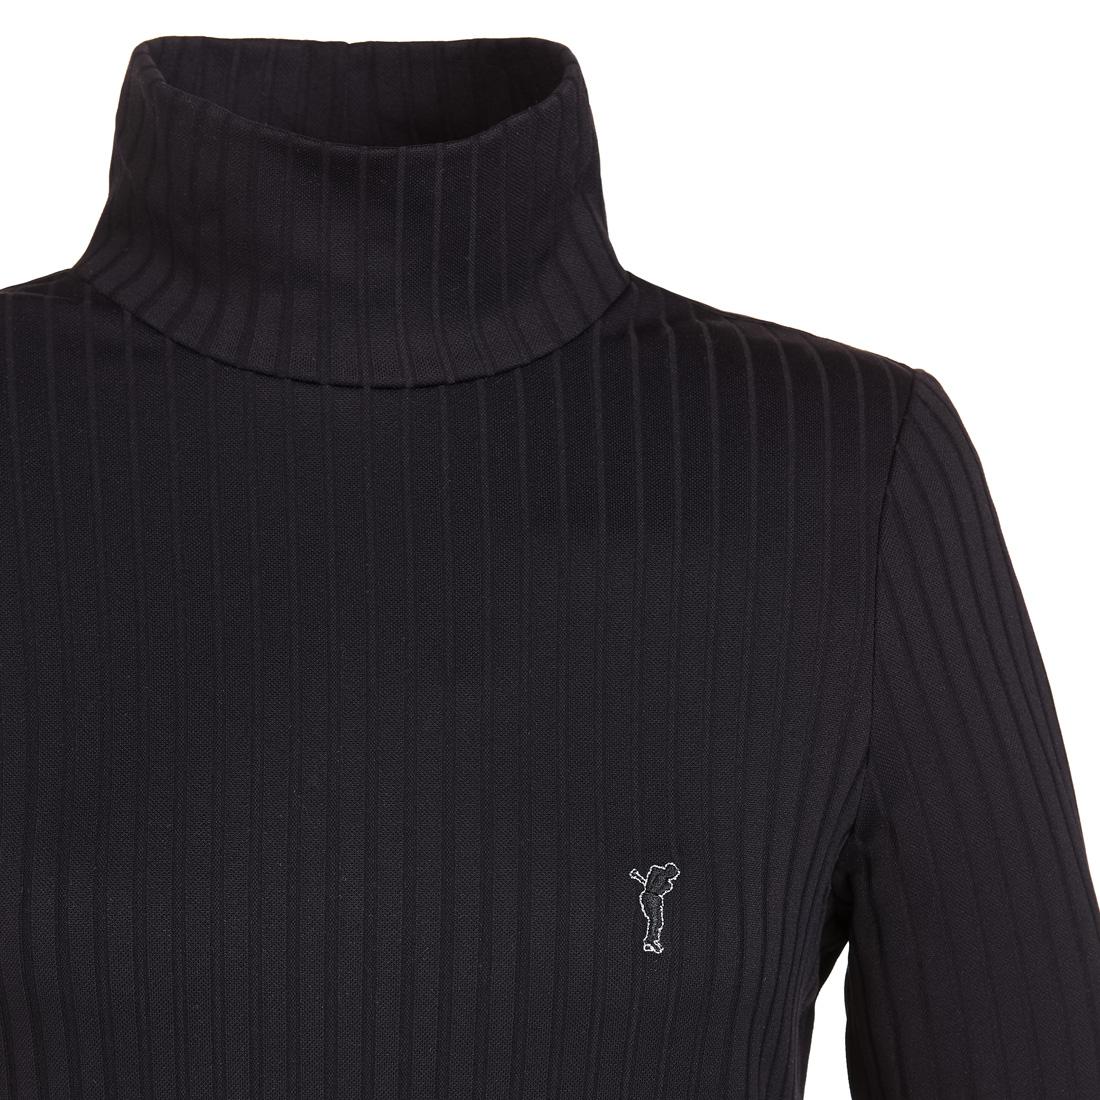 Damen Dry Comfort Rollkragen Stretchunterzieher in Slim Fit